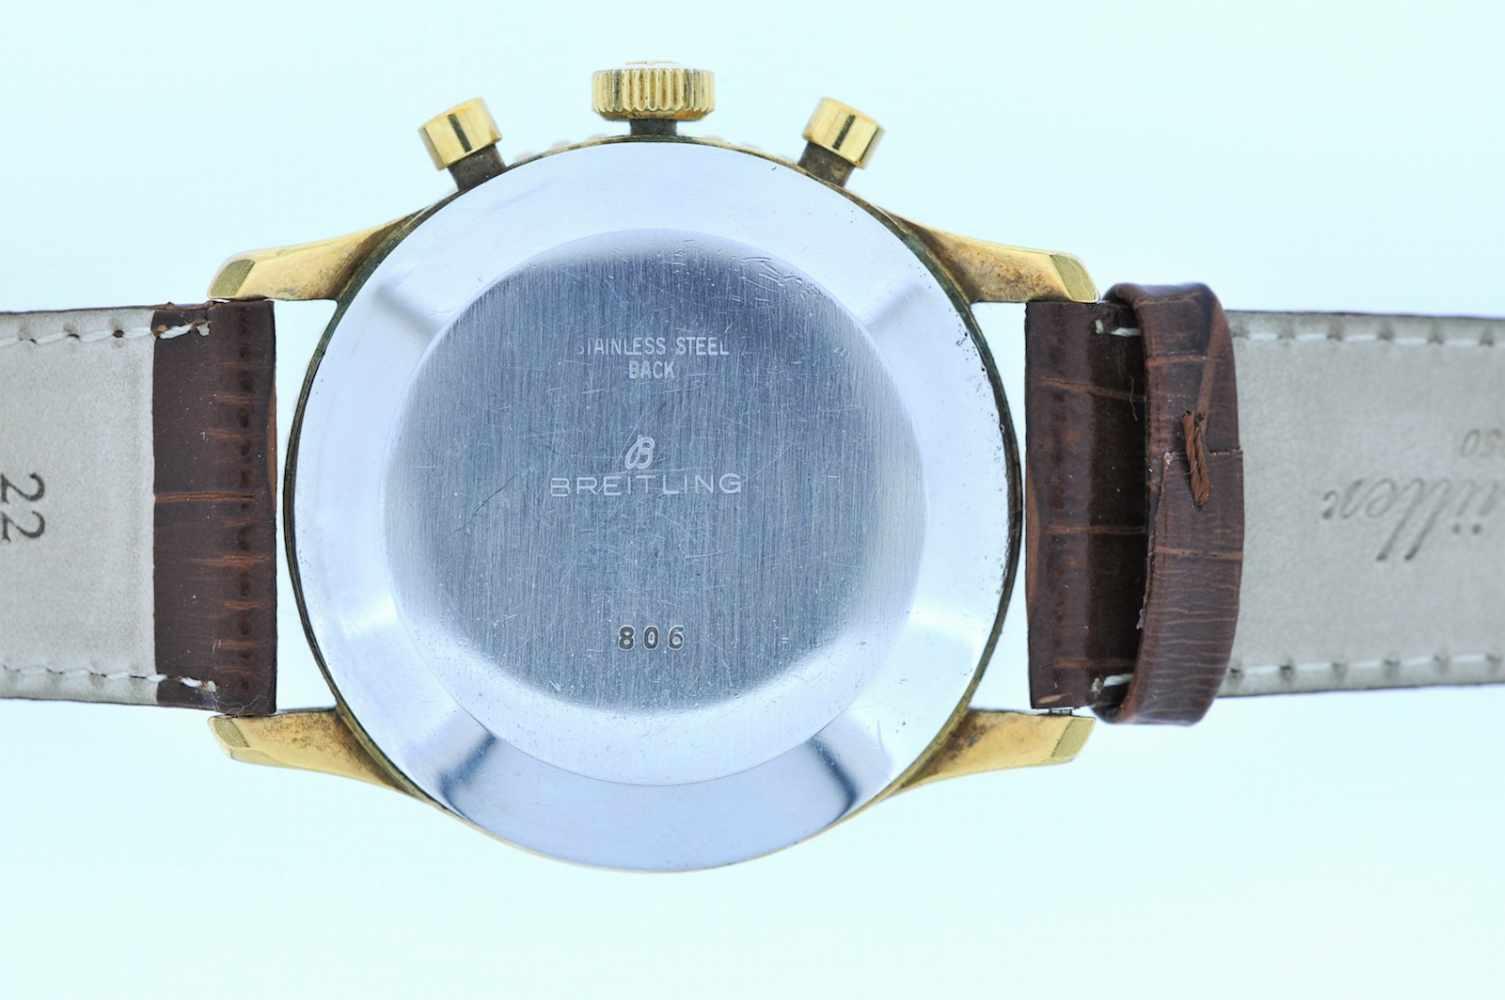 Breitling Stahl vergoldete Armbanduhr an Lederband, Breitling Navitimer, Fliegerchronograph, - Bild 5 aus 5